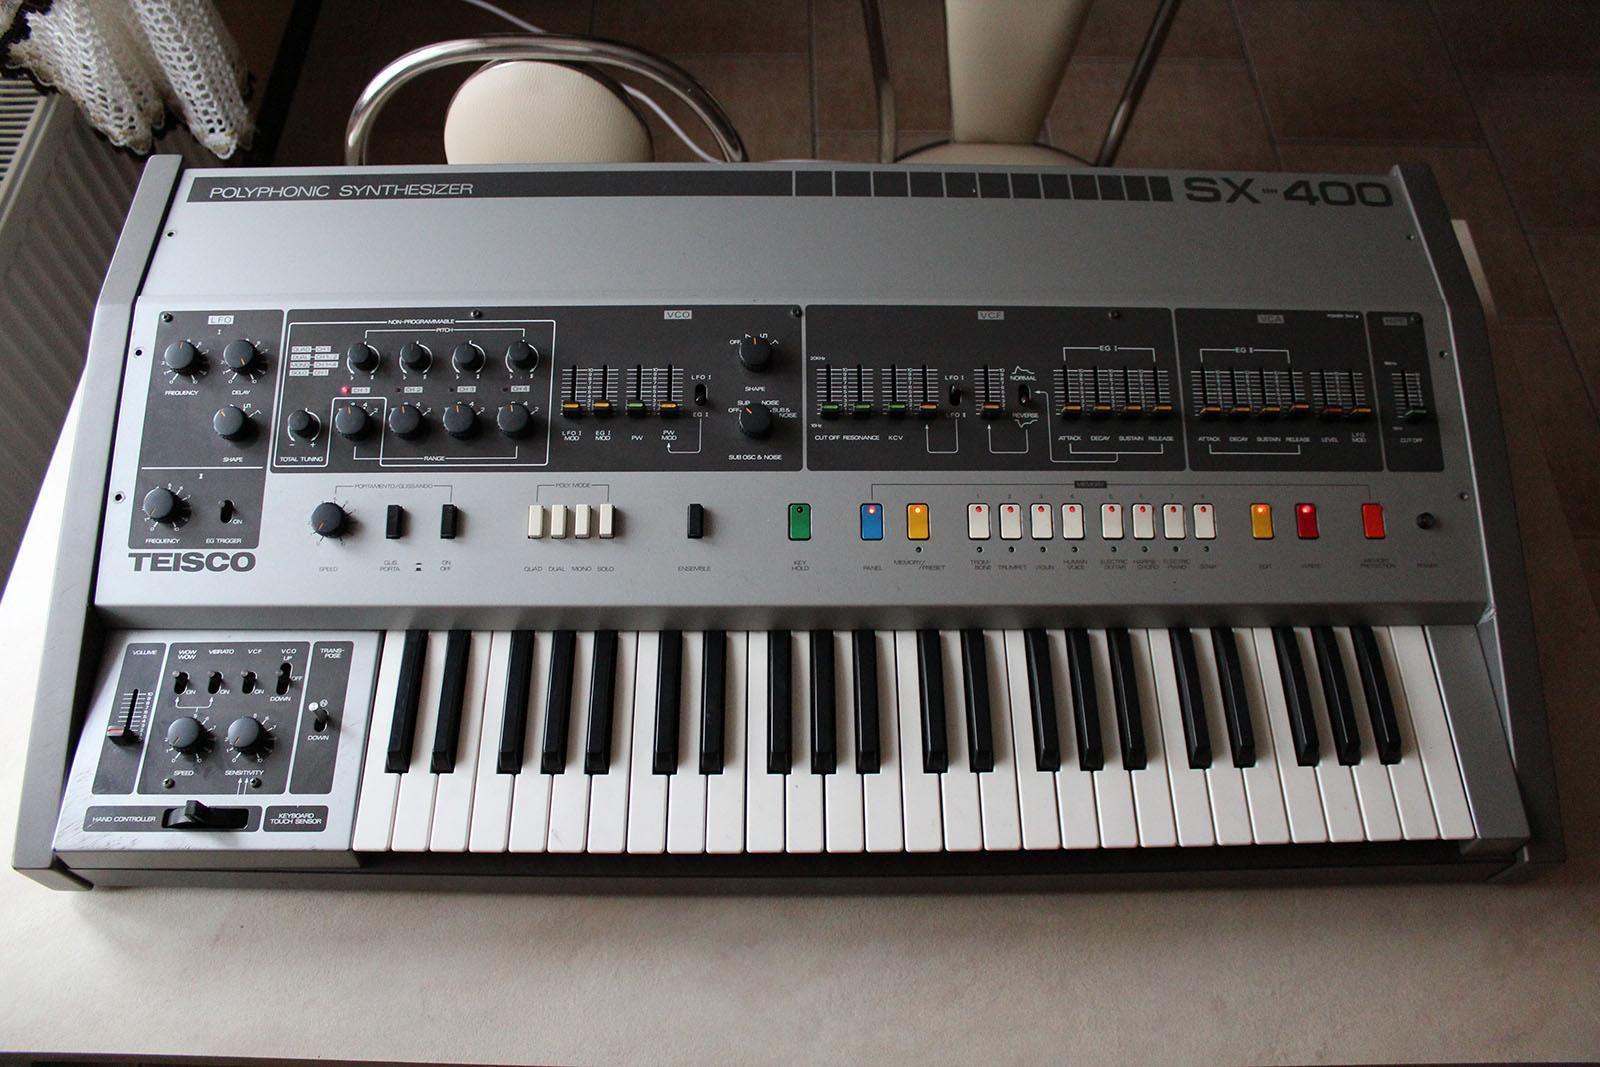 teisco sx 400 synth keys in 2019 music music den drum machine. Black Bedroom Furniture Sets. Home Design Ideas